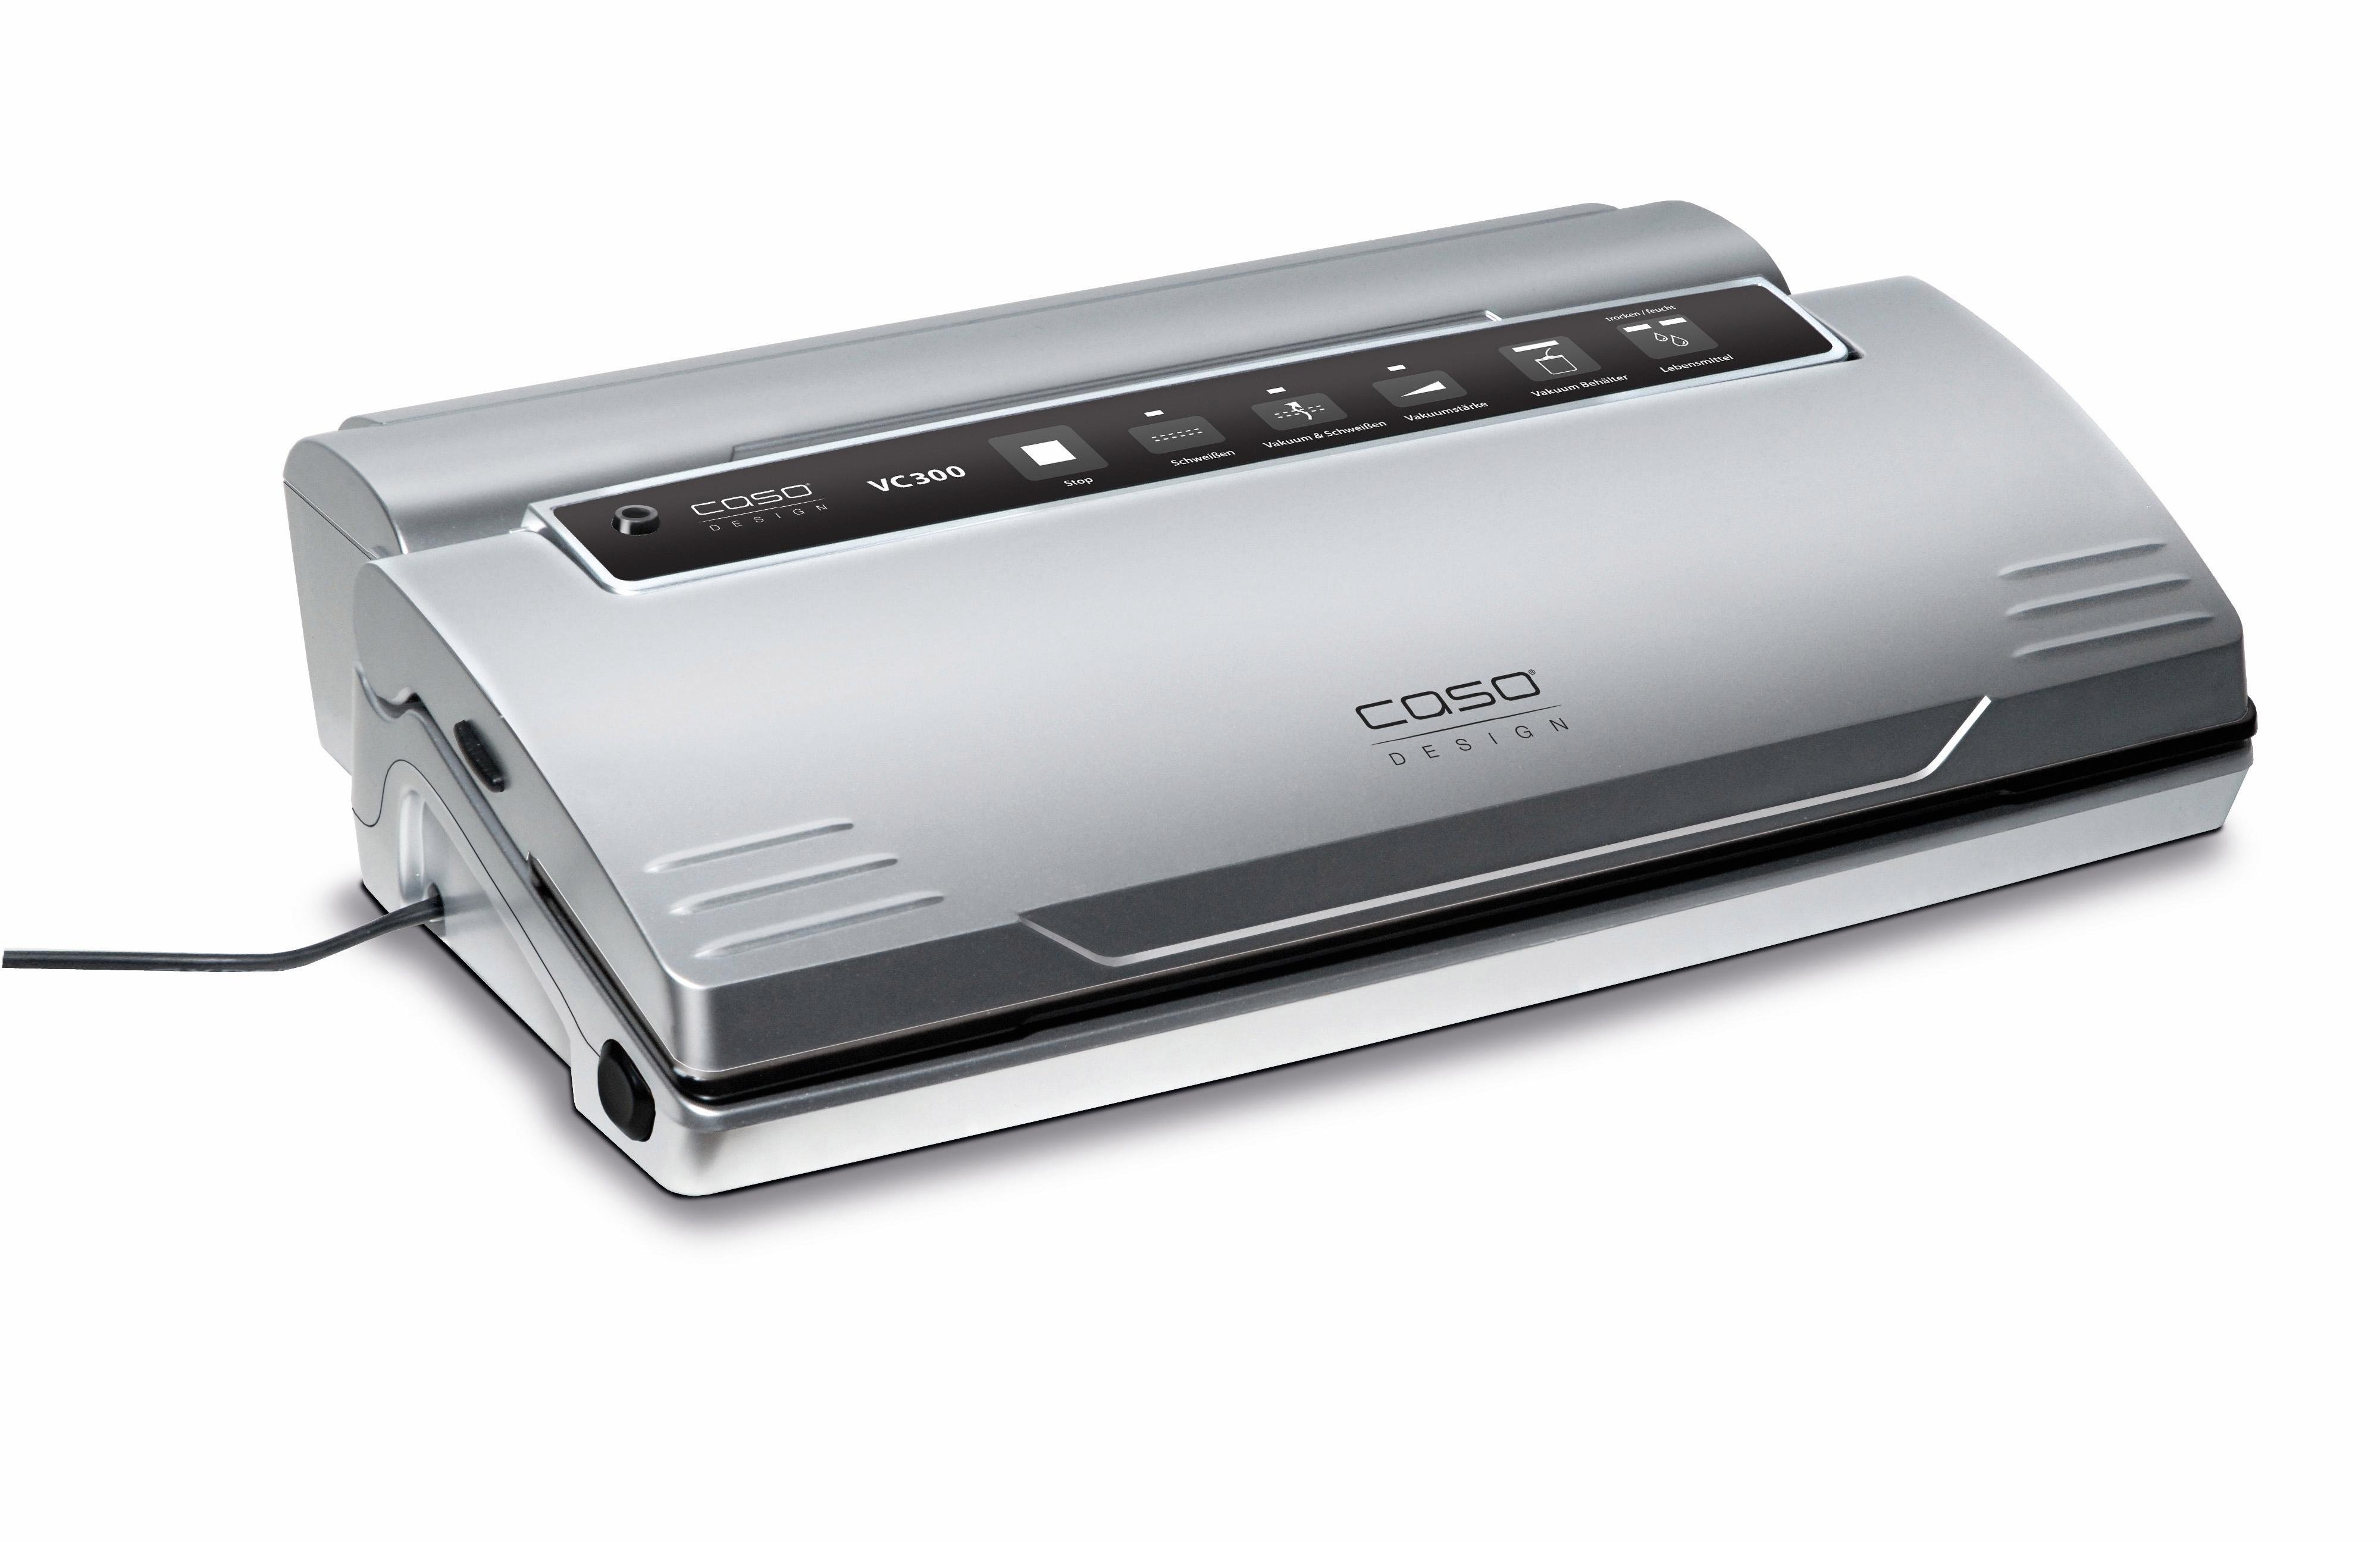 Caso vacumeermachine VC 300 Pro inclusief 2 professionele folierollen en 1 vacumeerslang - gratis ruilen op otto.nl